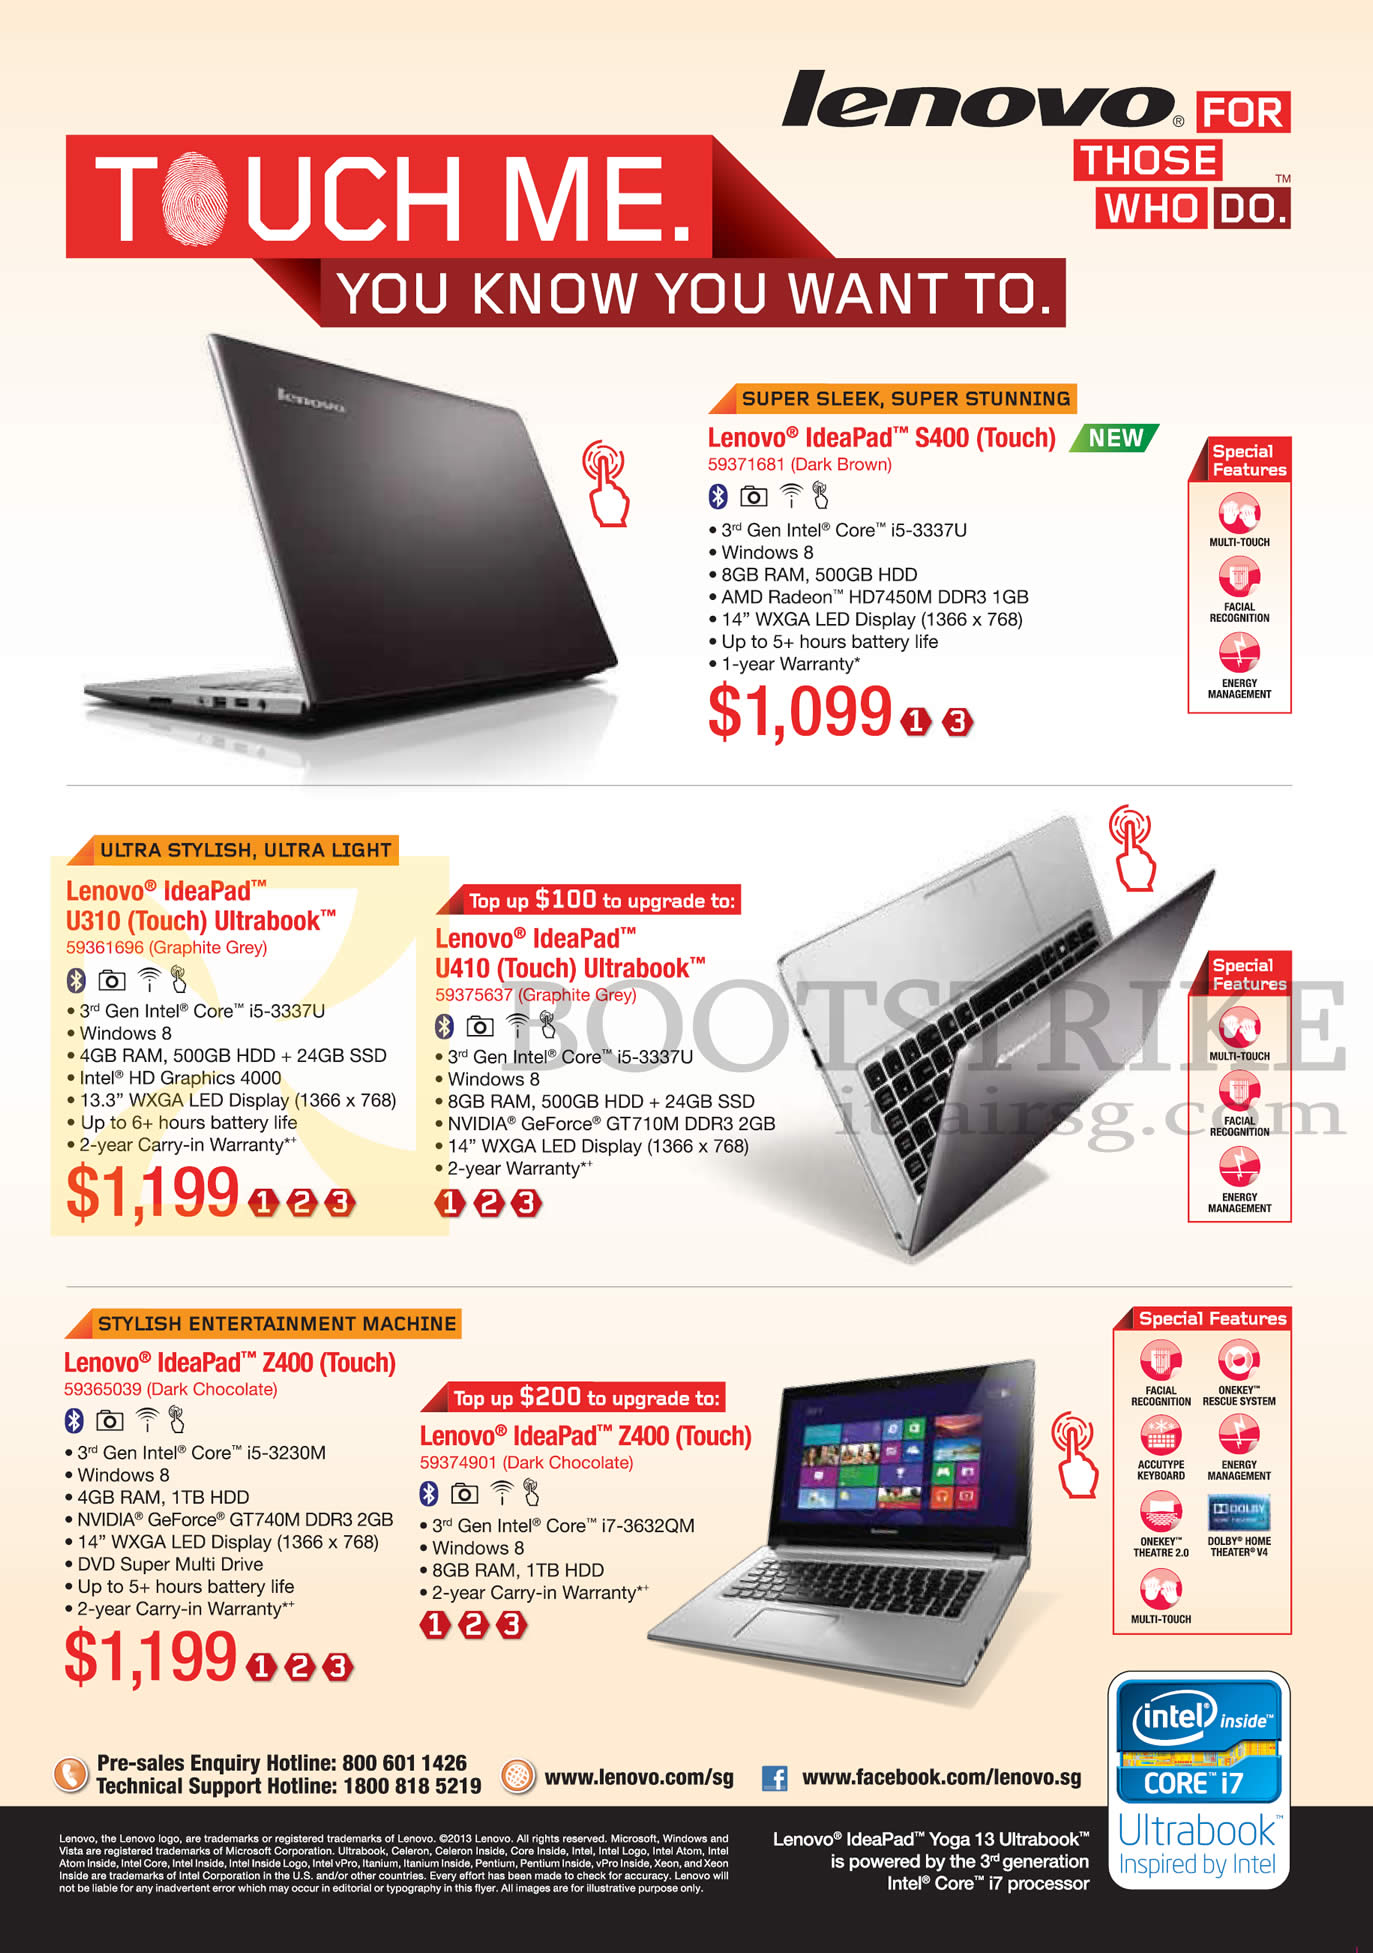 PC SHOW 2013 price list image brochure of Lenovo Notebooks Ideapad S400, U310, U410, Z400